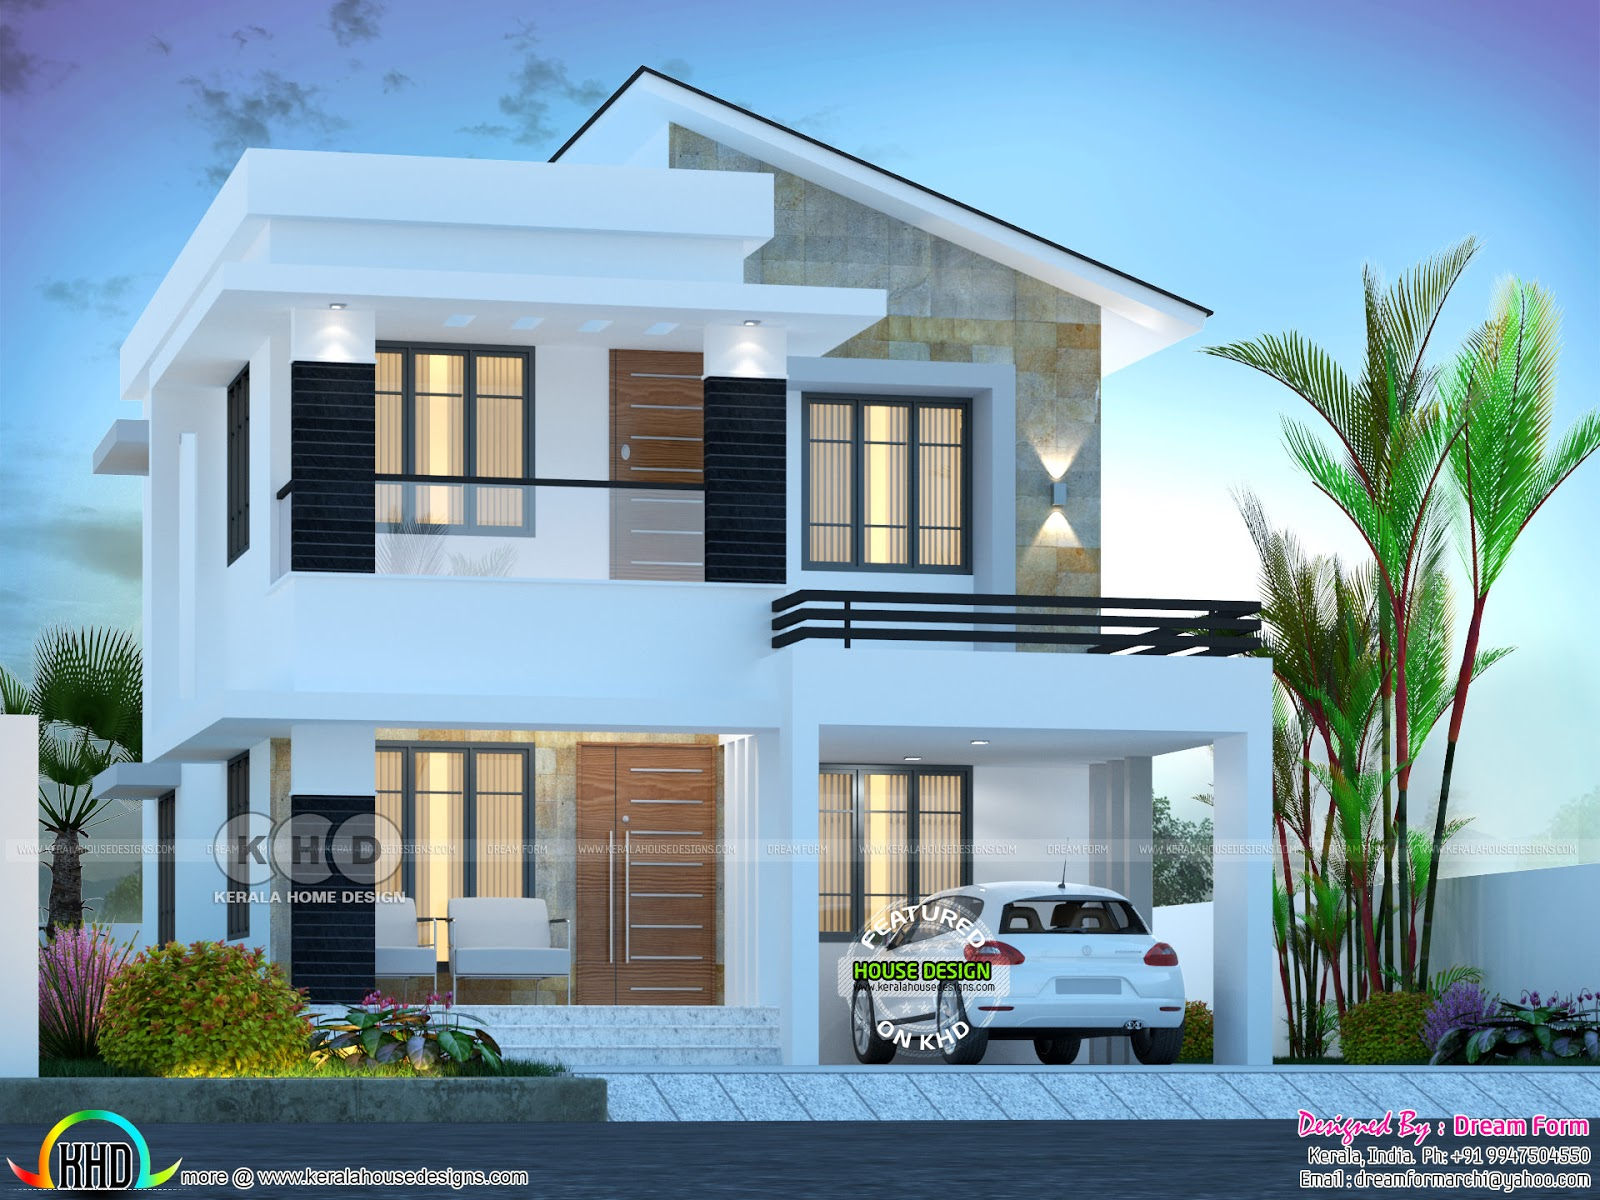 3 Bedroom 1750 Sq Ft Beautiful Modern Home Design Kerala Home Design And Floor Plans 8000 Houses